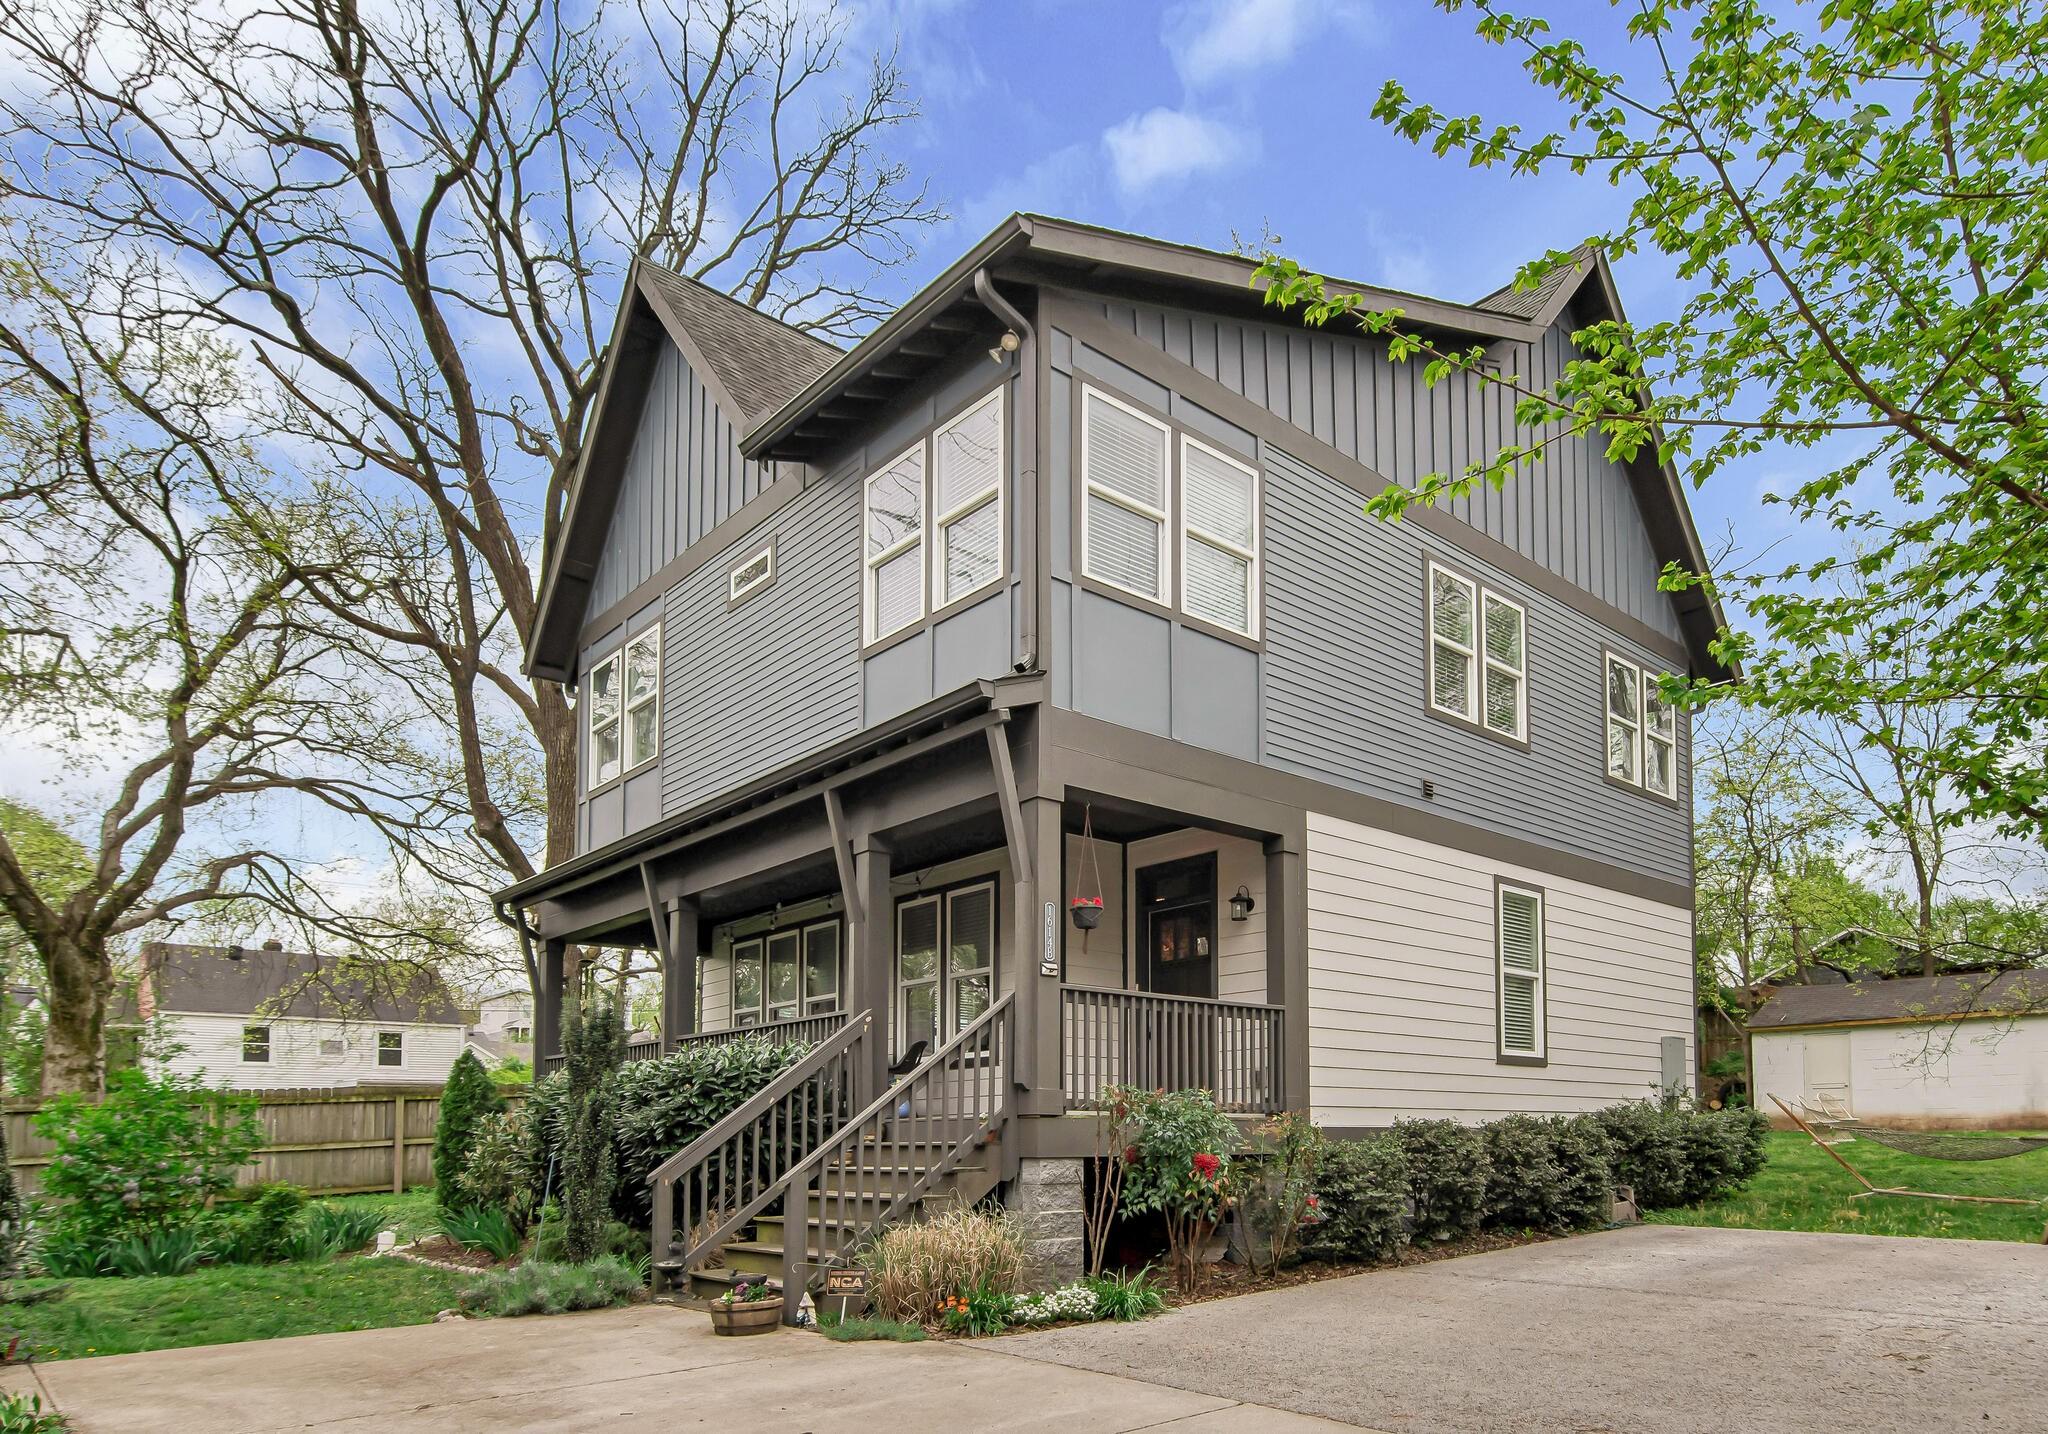 1614B Marsden Ave Property Photo - Nashville, TN real estate listing